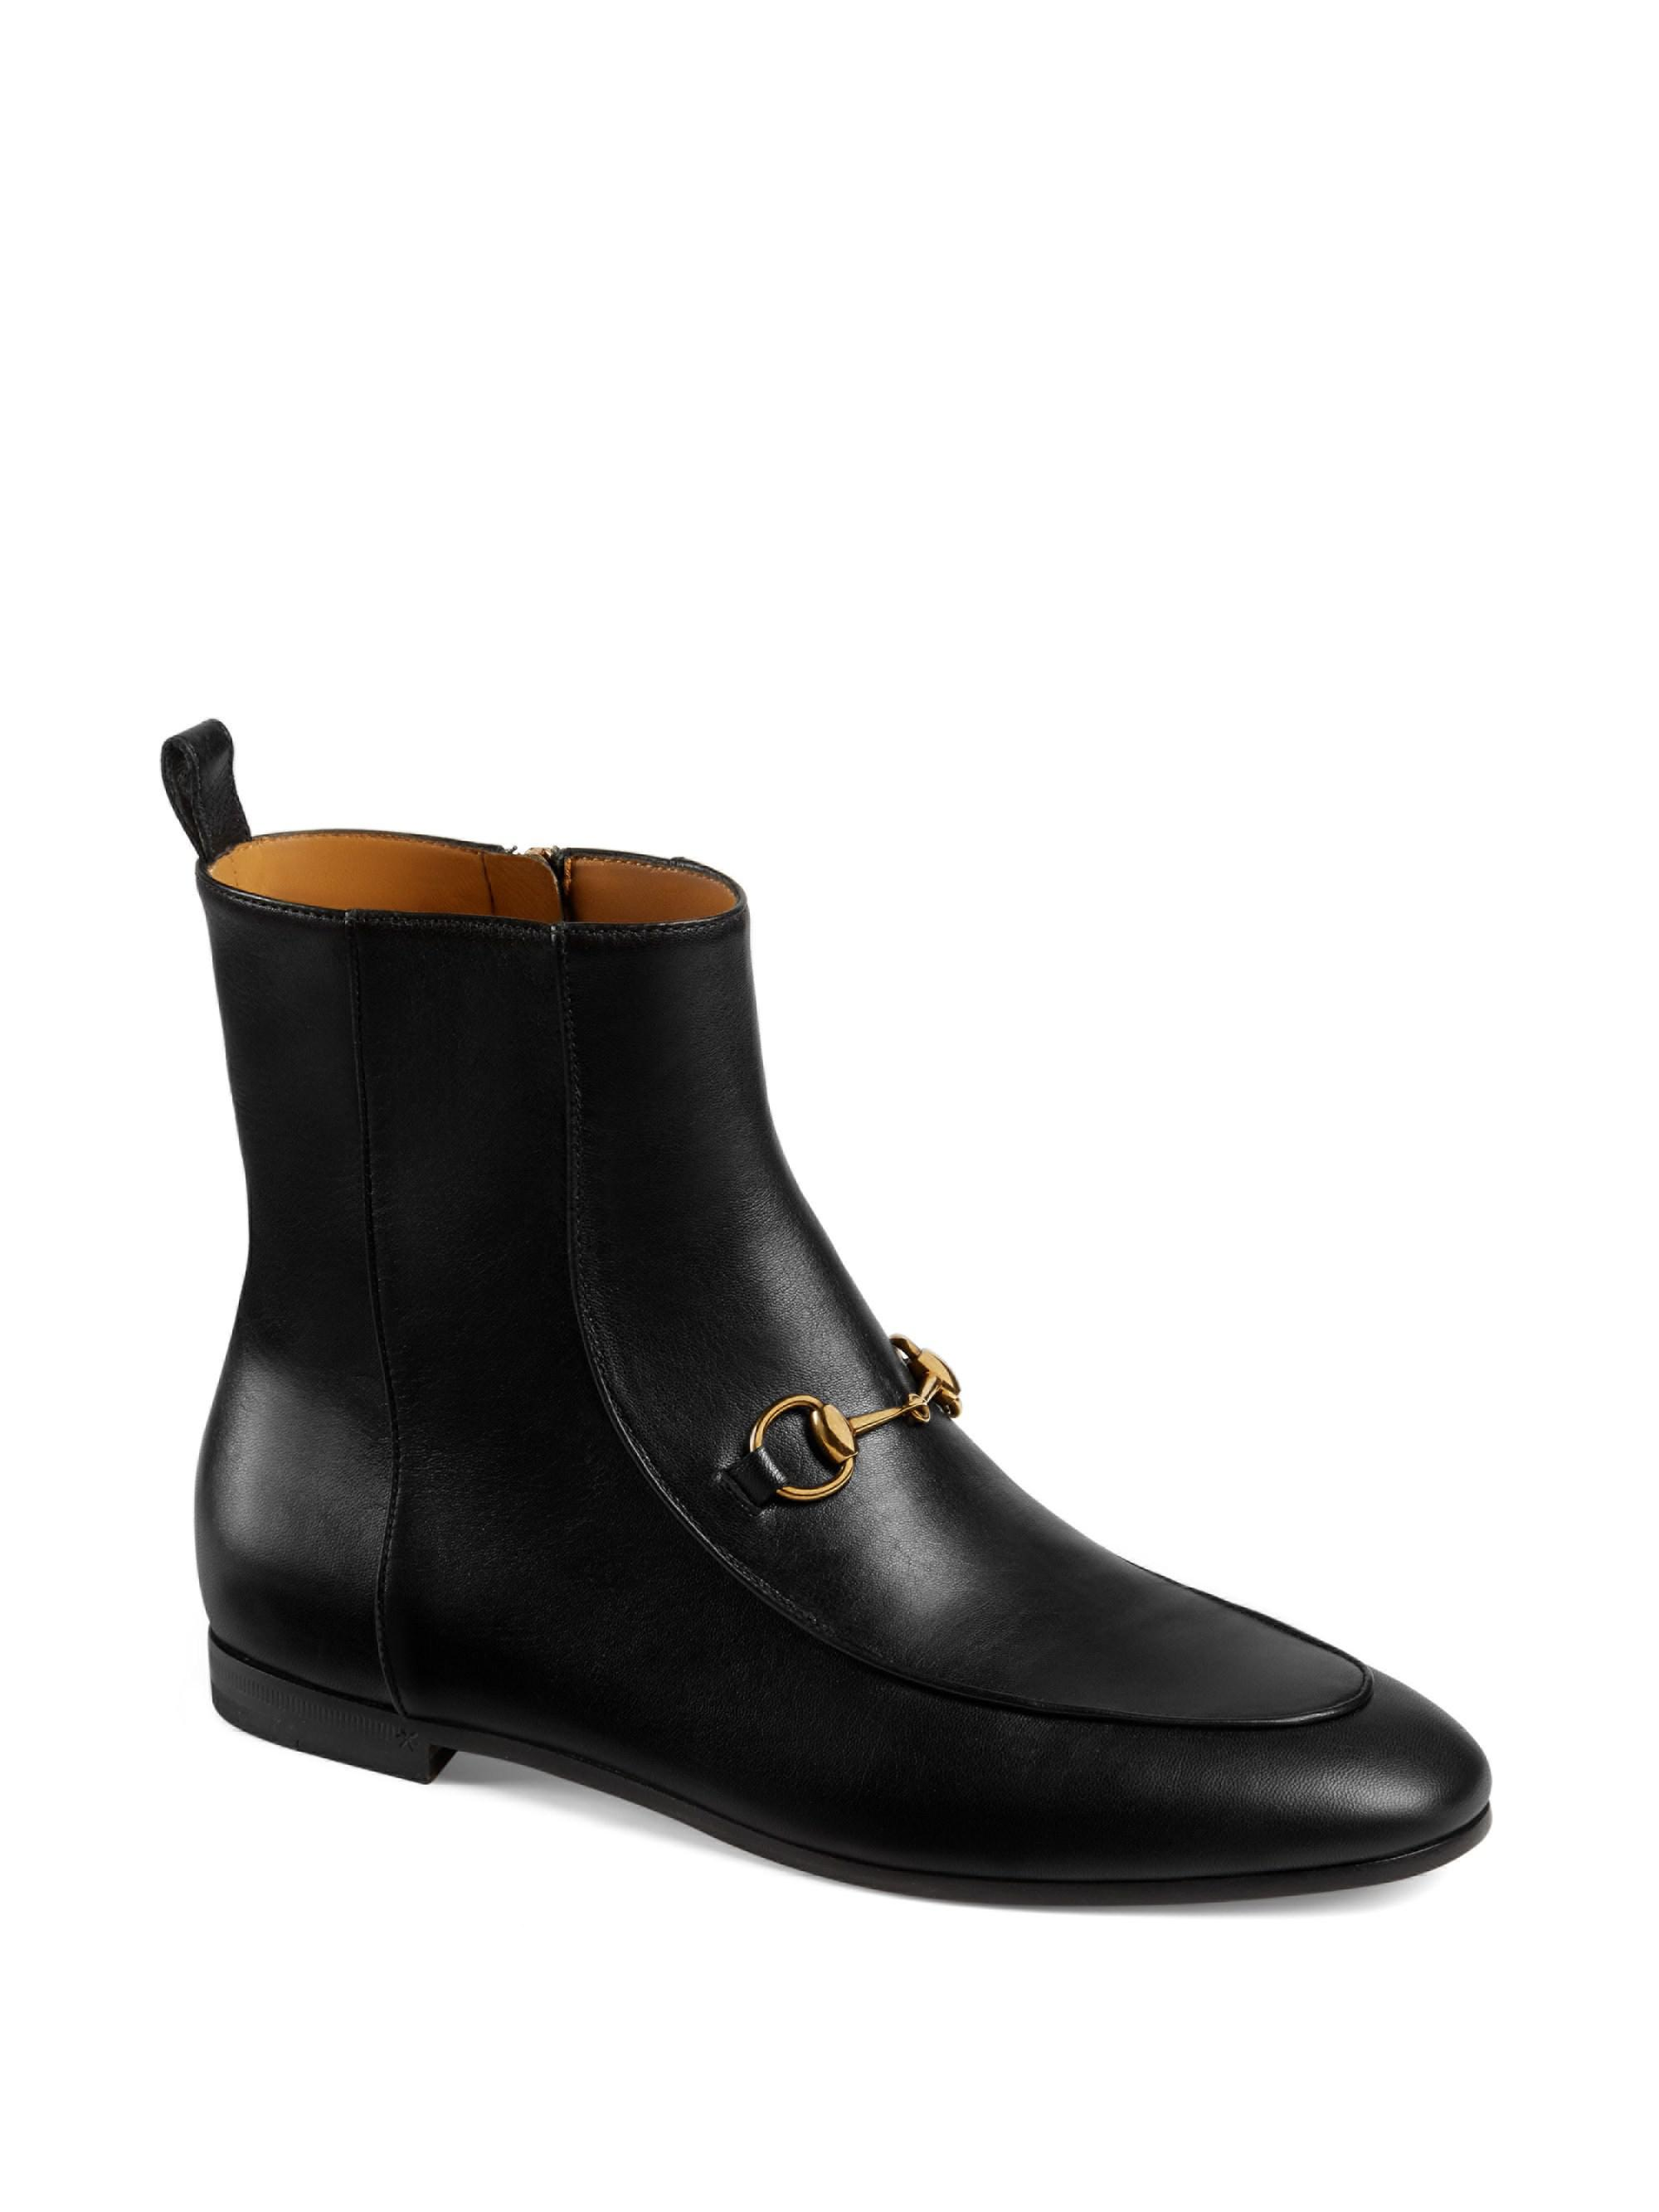 c0801782af0 Lyst - Gucci Jordaan Leather Ankle Boots in Black